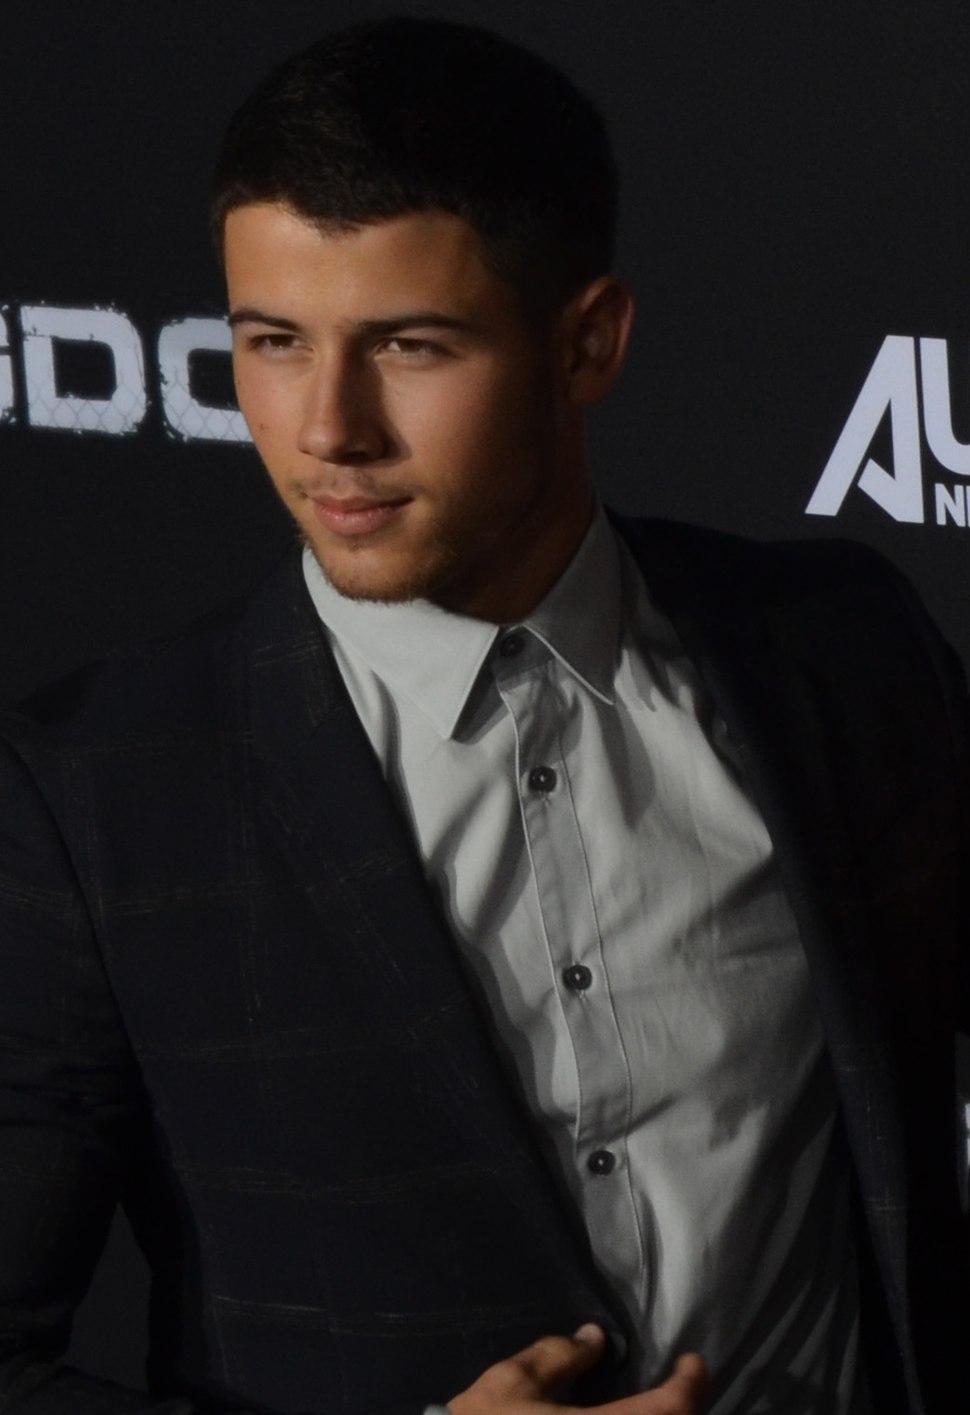 Nick Jonas - Kingdom Premiere Oct 2014 (cropped) (cropped)